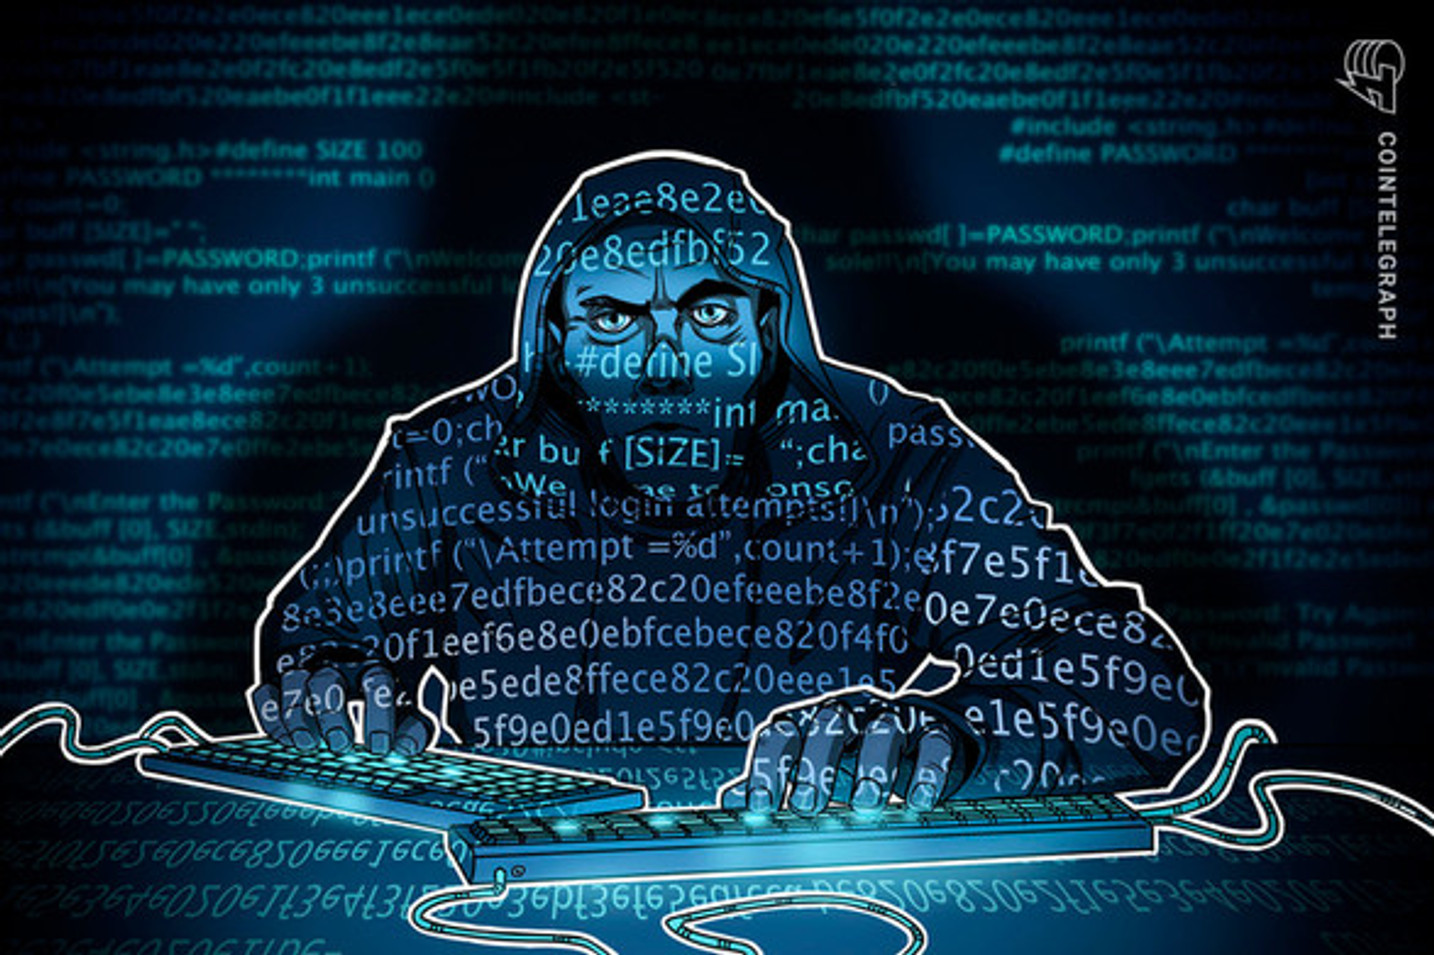 Golpe que fez investidor perder 1.400 Bitcoins continua fazendo vítimas na internet